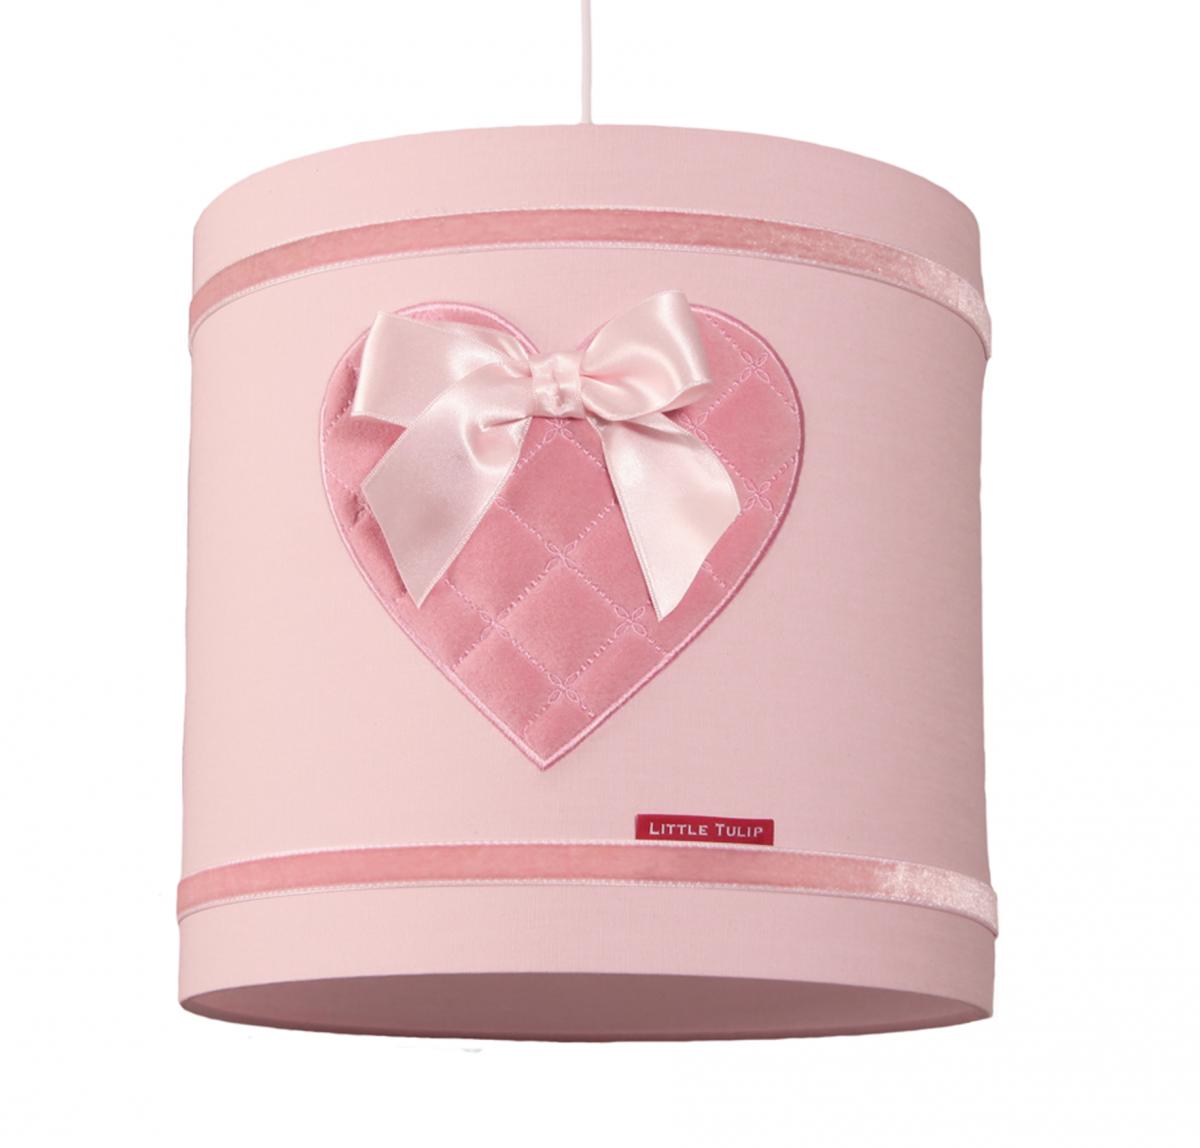 Little tulip shop hanglamp roze hart - Roze kinderkamer ...